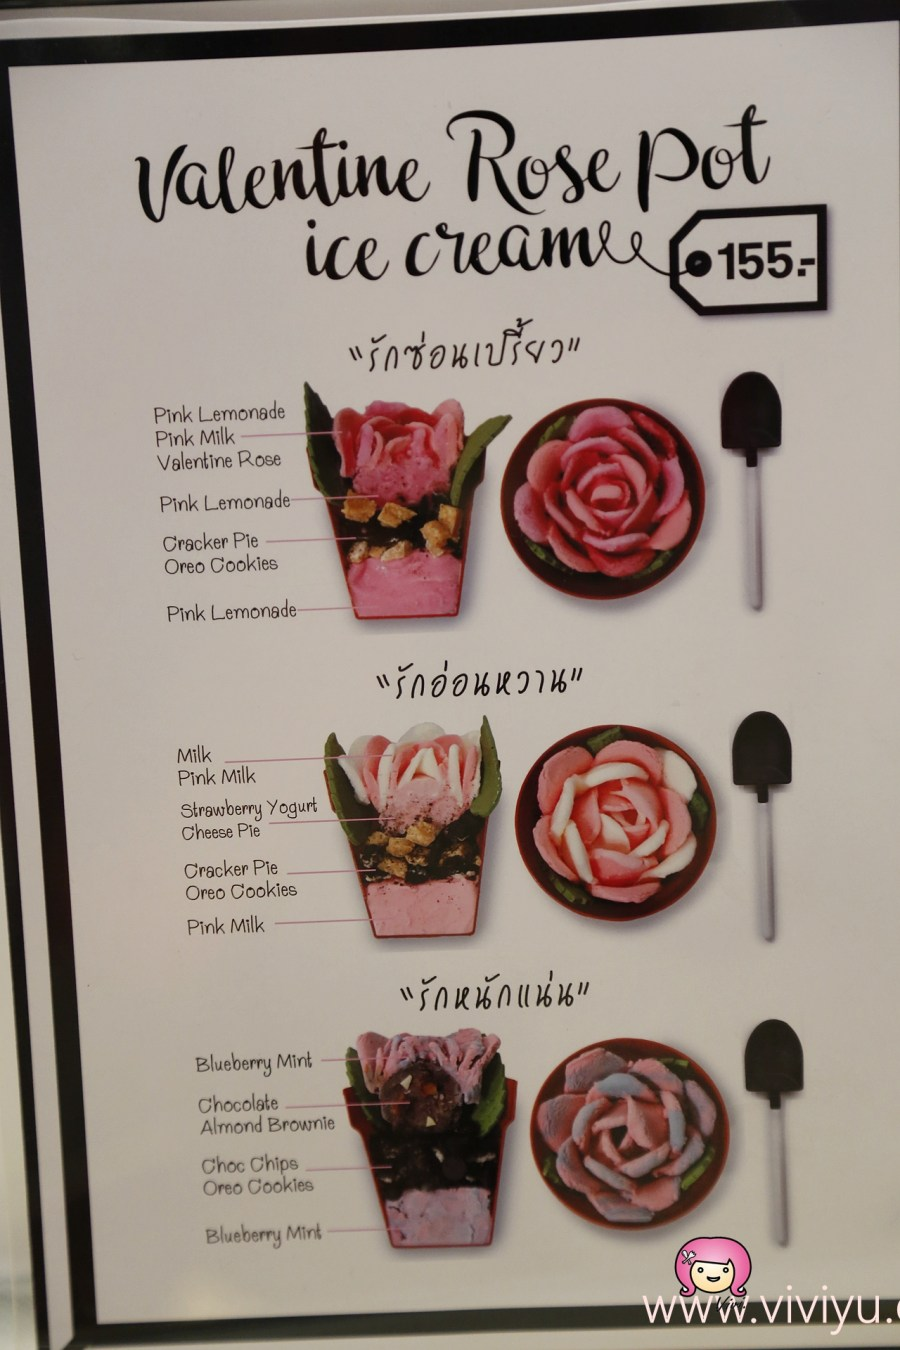 BACC,IceDEA,icedea曼谷,National Stadium BTS Station站,創意冰品,曼谷冰品,曼谷冰淇淋,曼谷創意冰淇淋,曼谷美食 @VIVIYU小世界